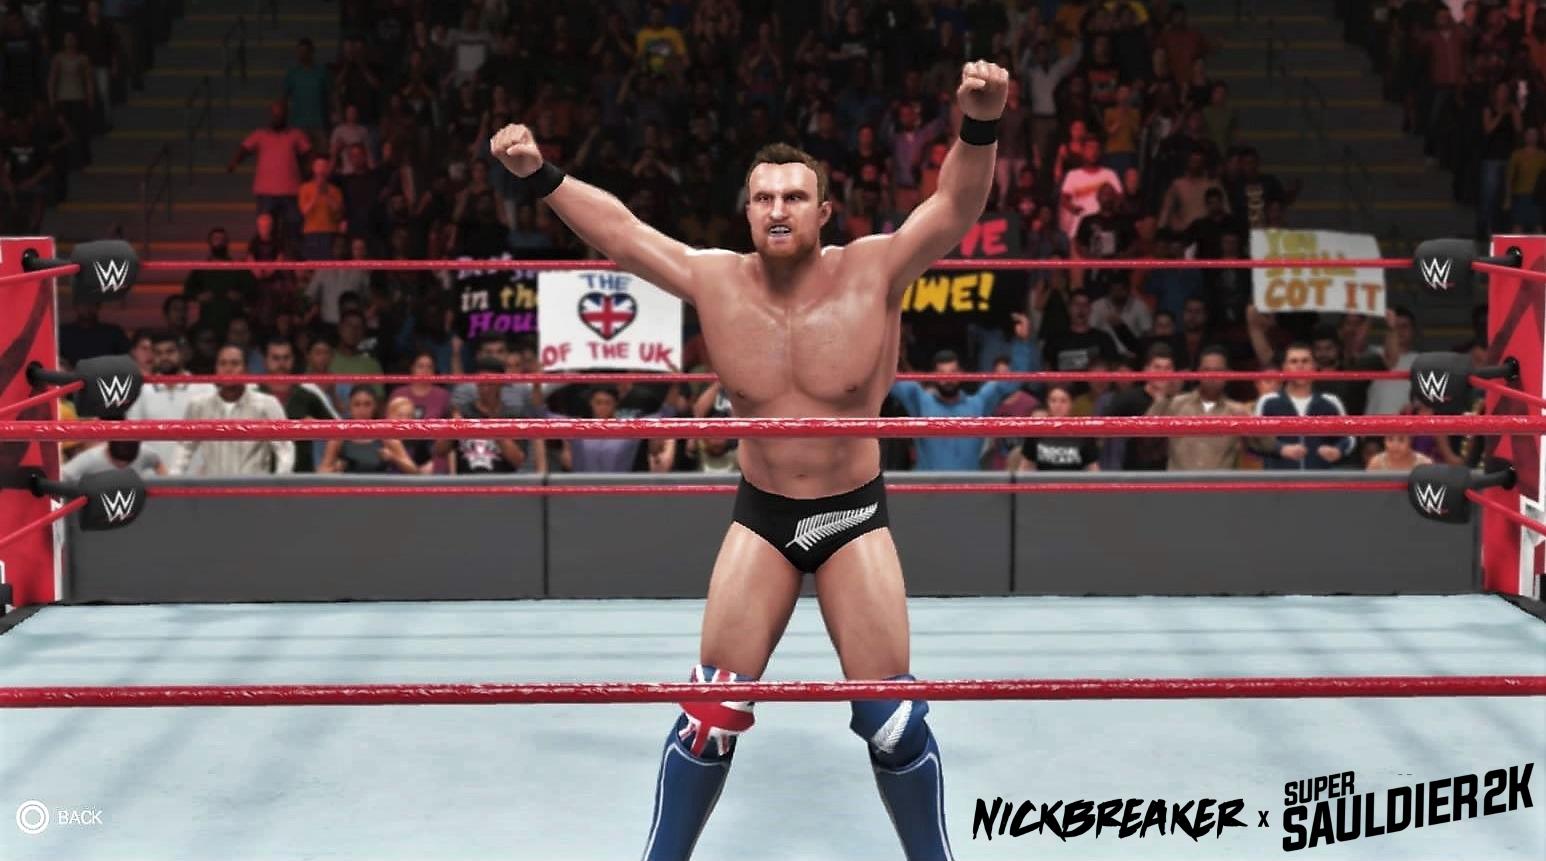 TEMPLATE.NICKBREAKER.WWE.2K18.2K19.2K20.